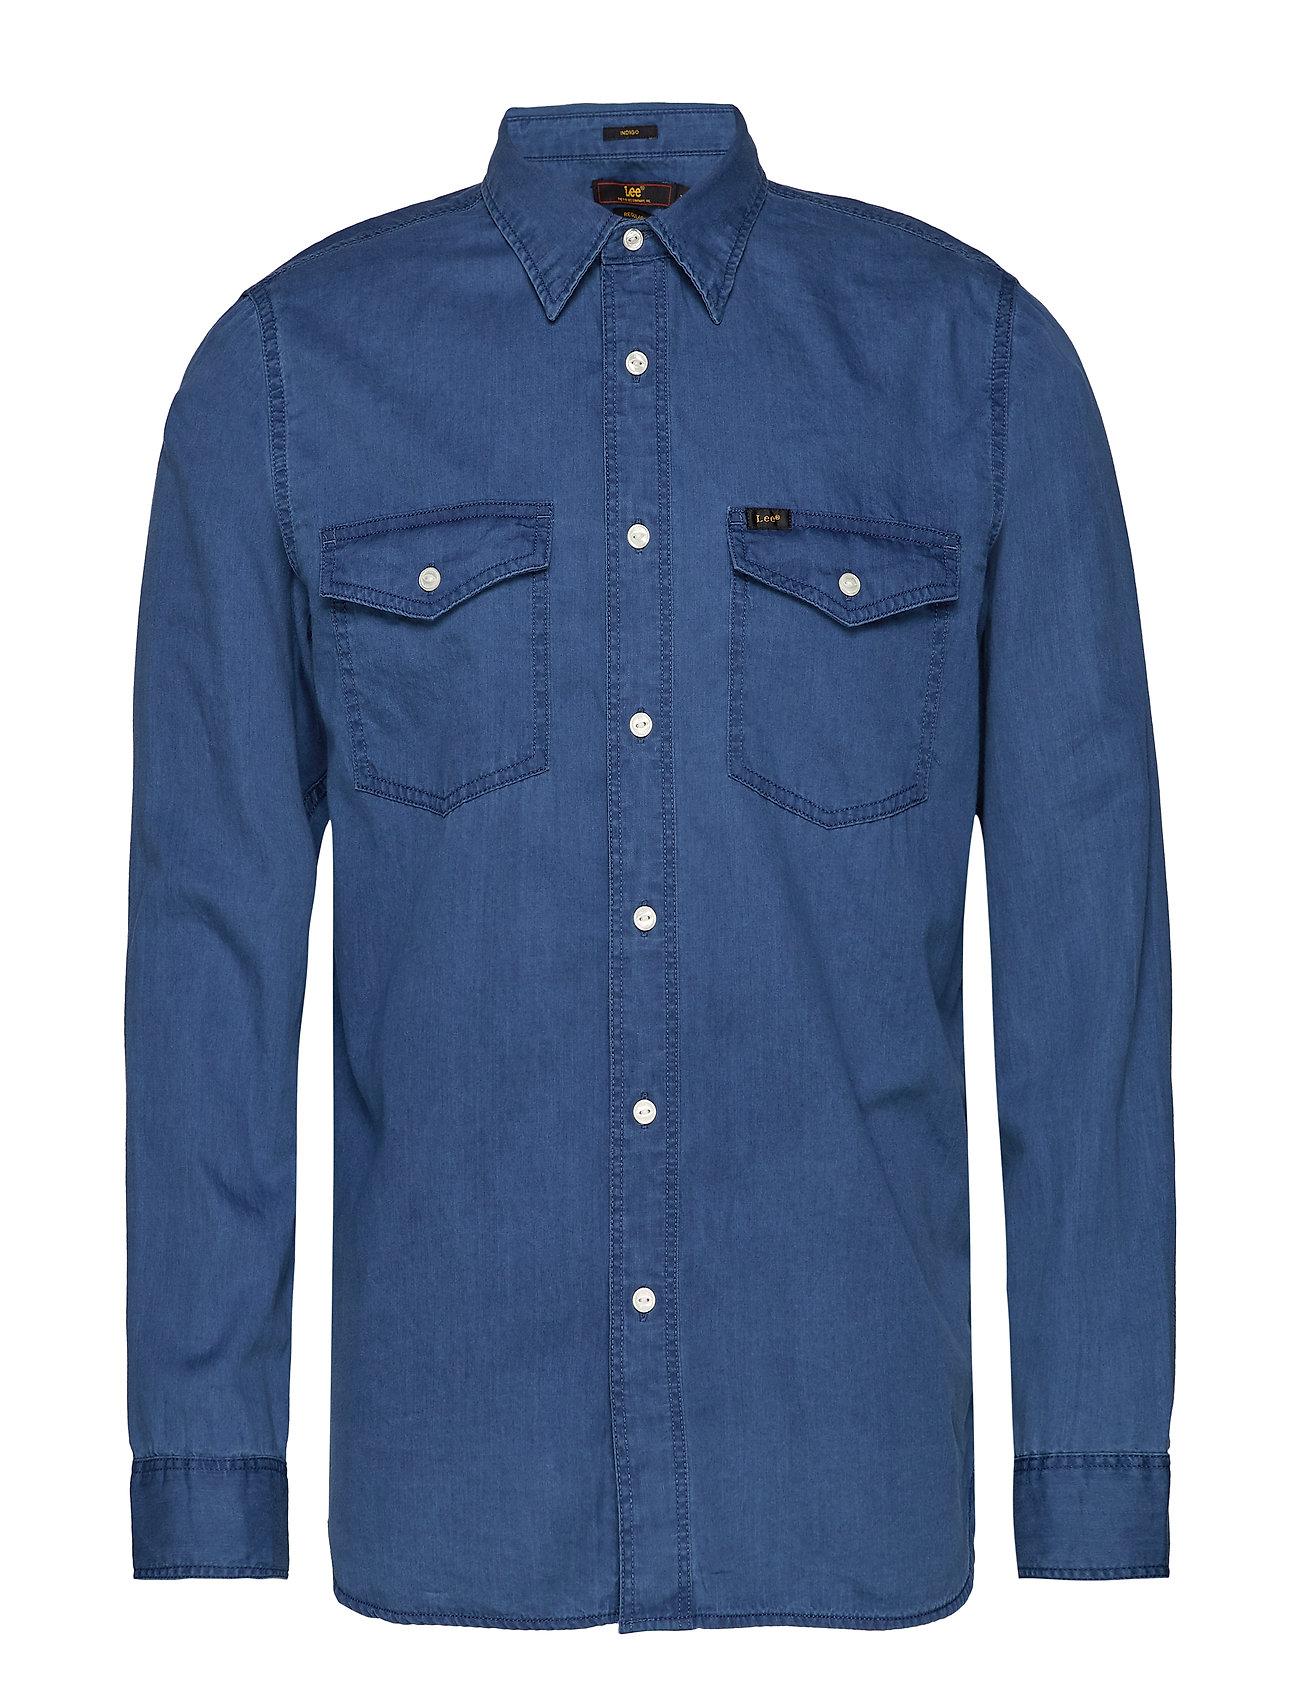 Lee Jeans REG.CLEAN WESTERN - CITY BLUE